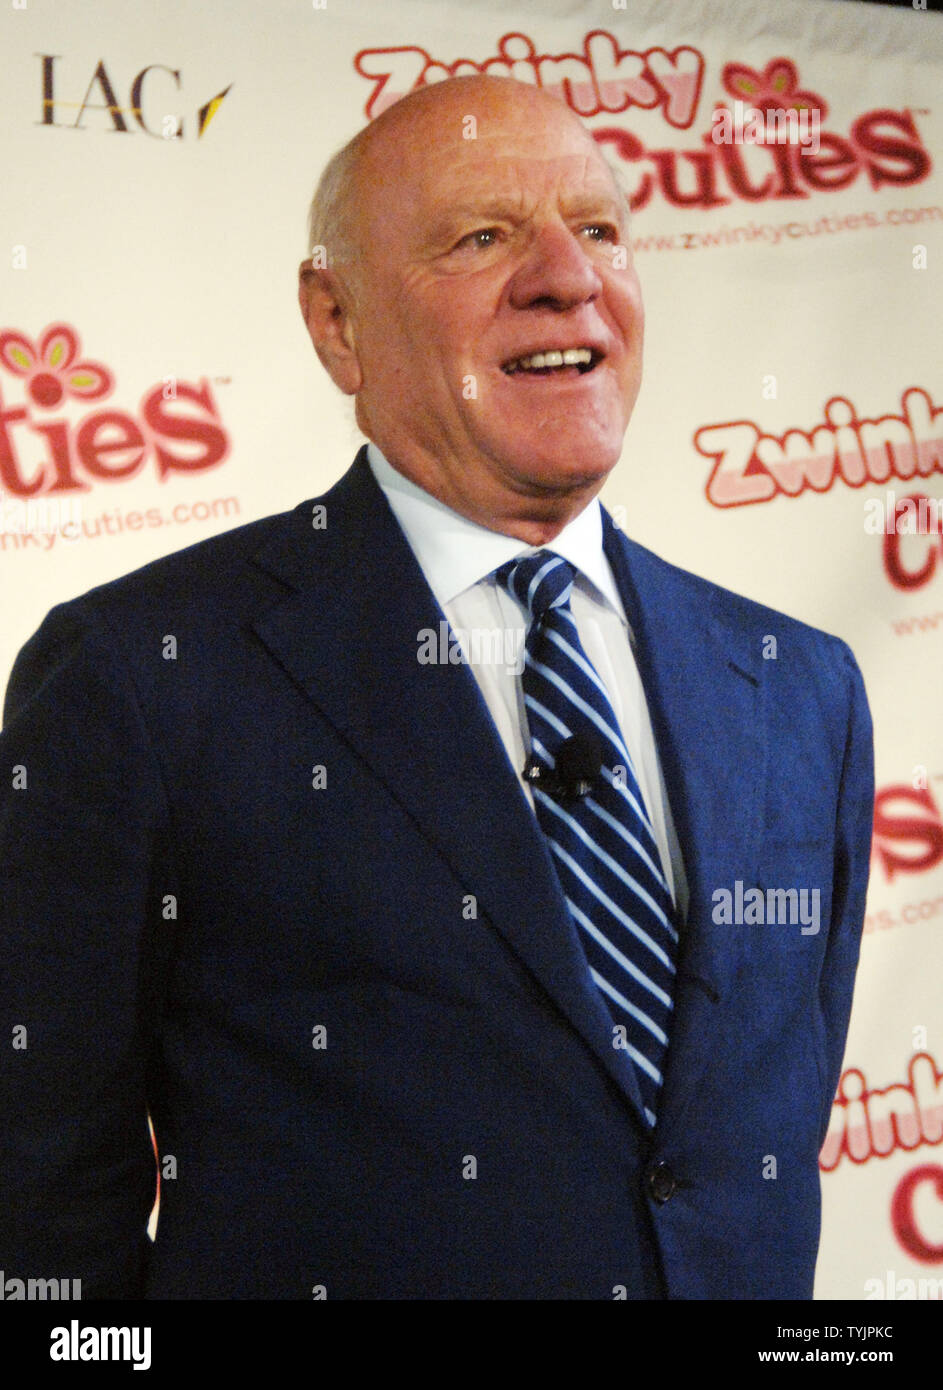 IAC Chairman Barry Diller joins with Disney singer Jordan